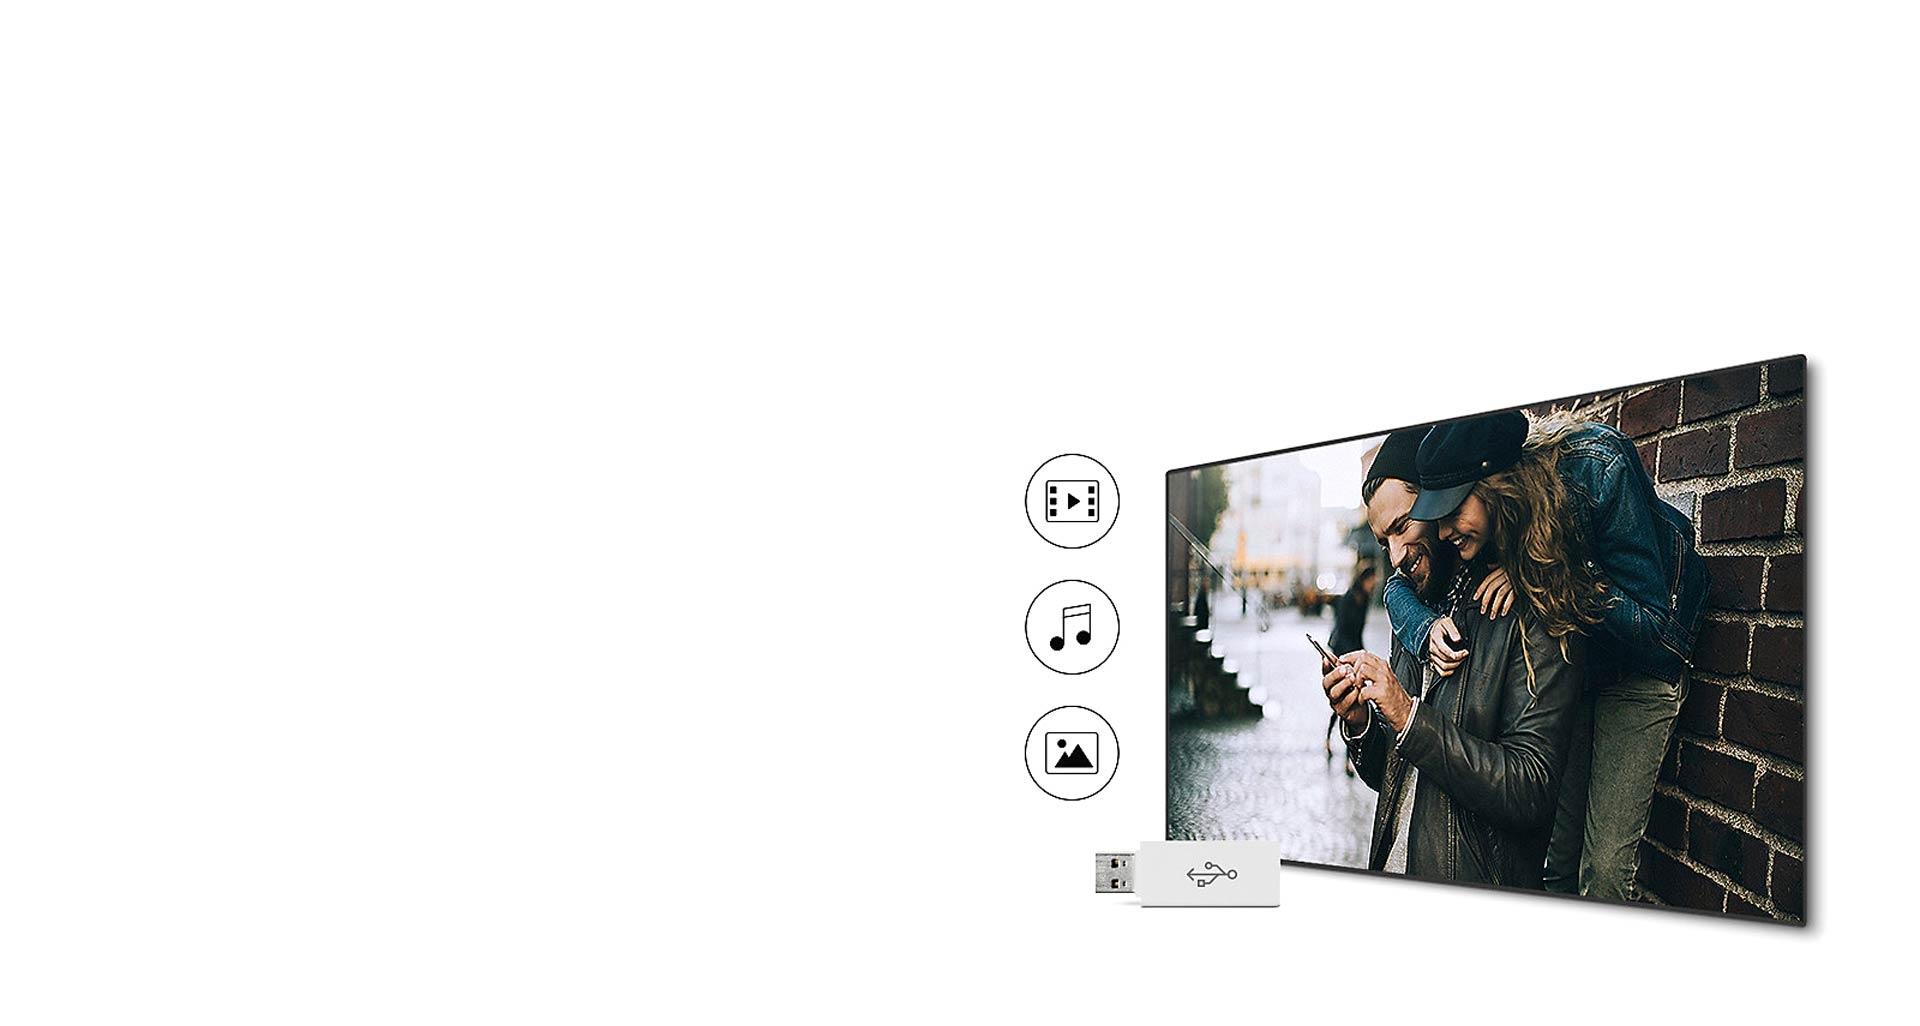 تلویزیون منحنی Full HD سامسونگ با قابلیت اشتراک گذاری محتوا